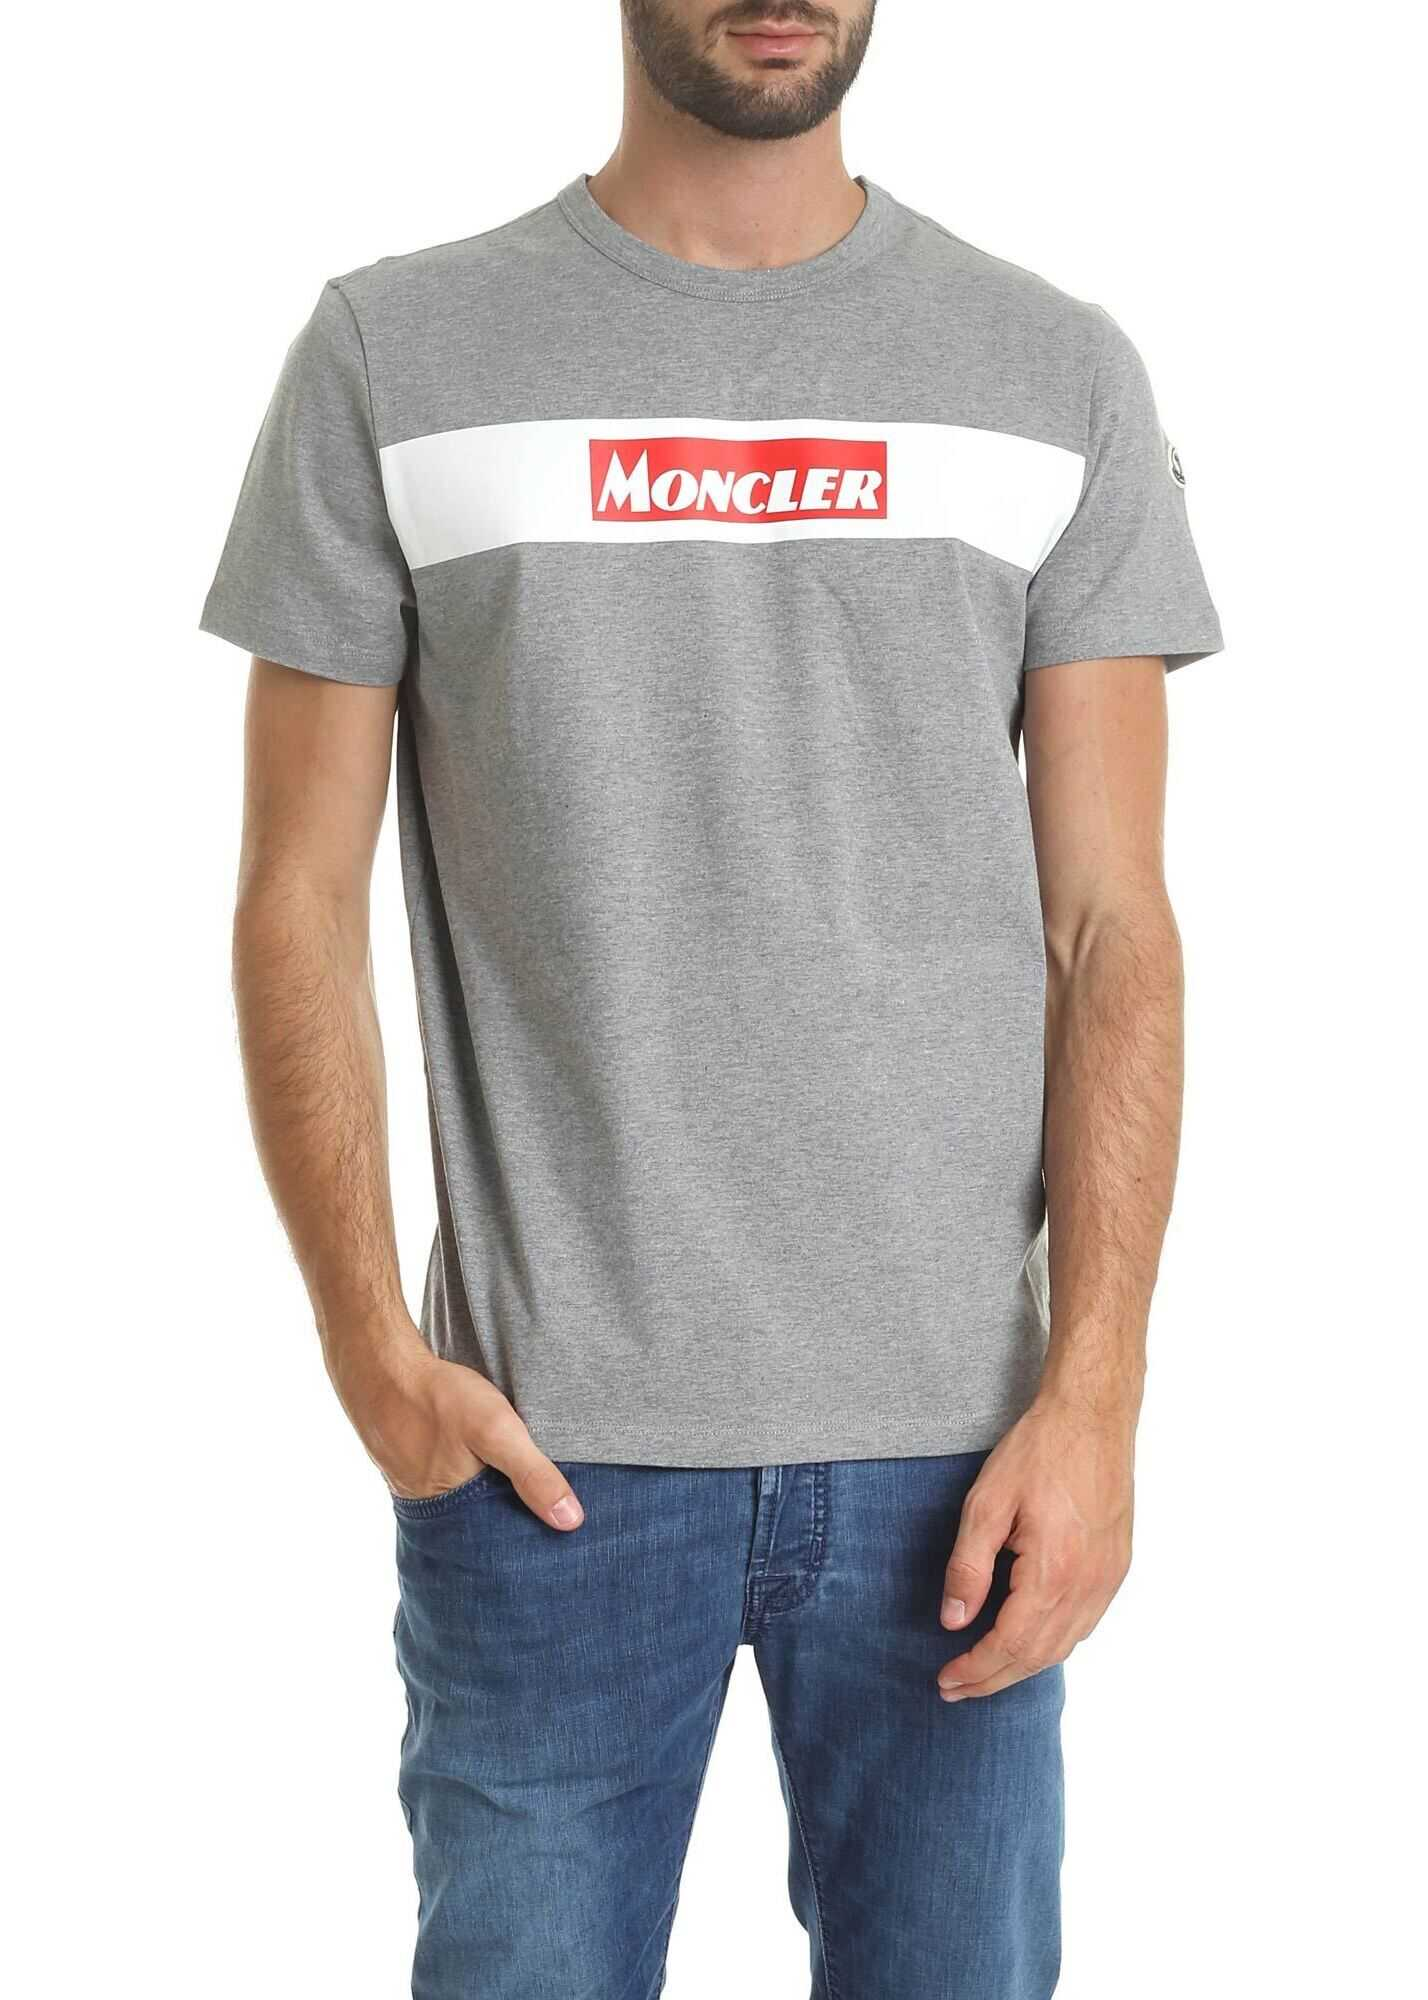 Moncler Moncler Printed T-Shirt In Grey Grey